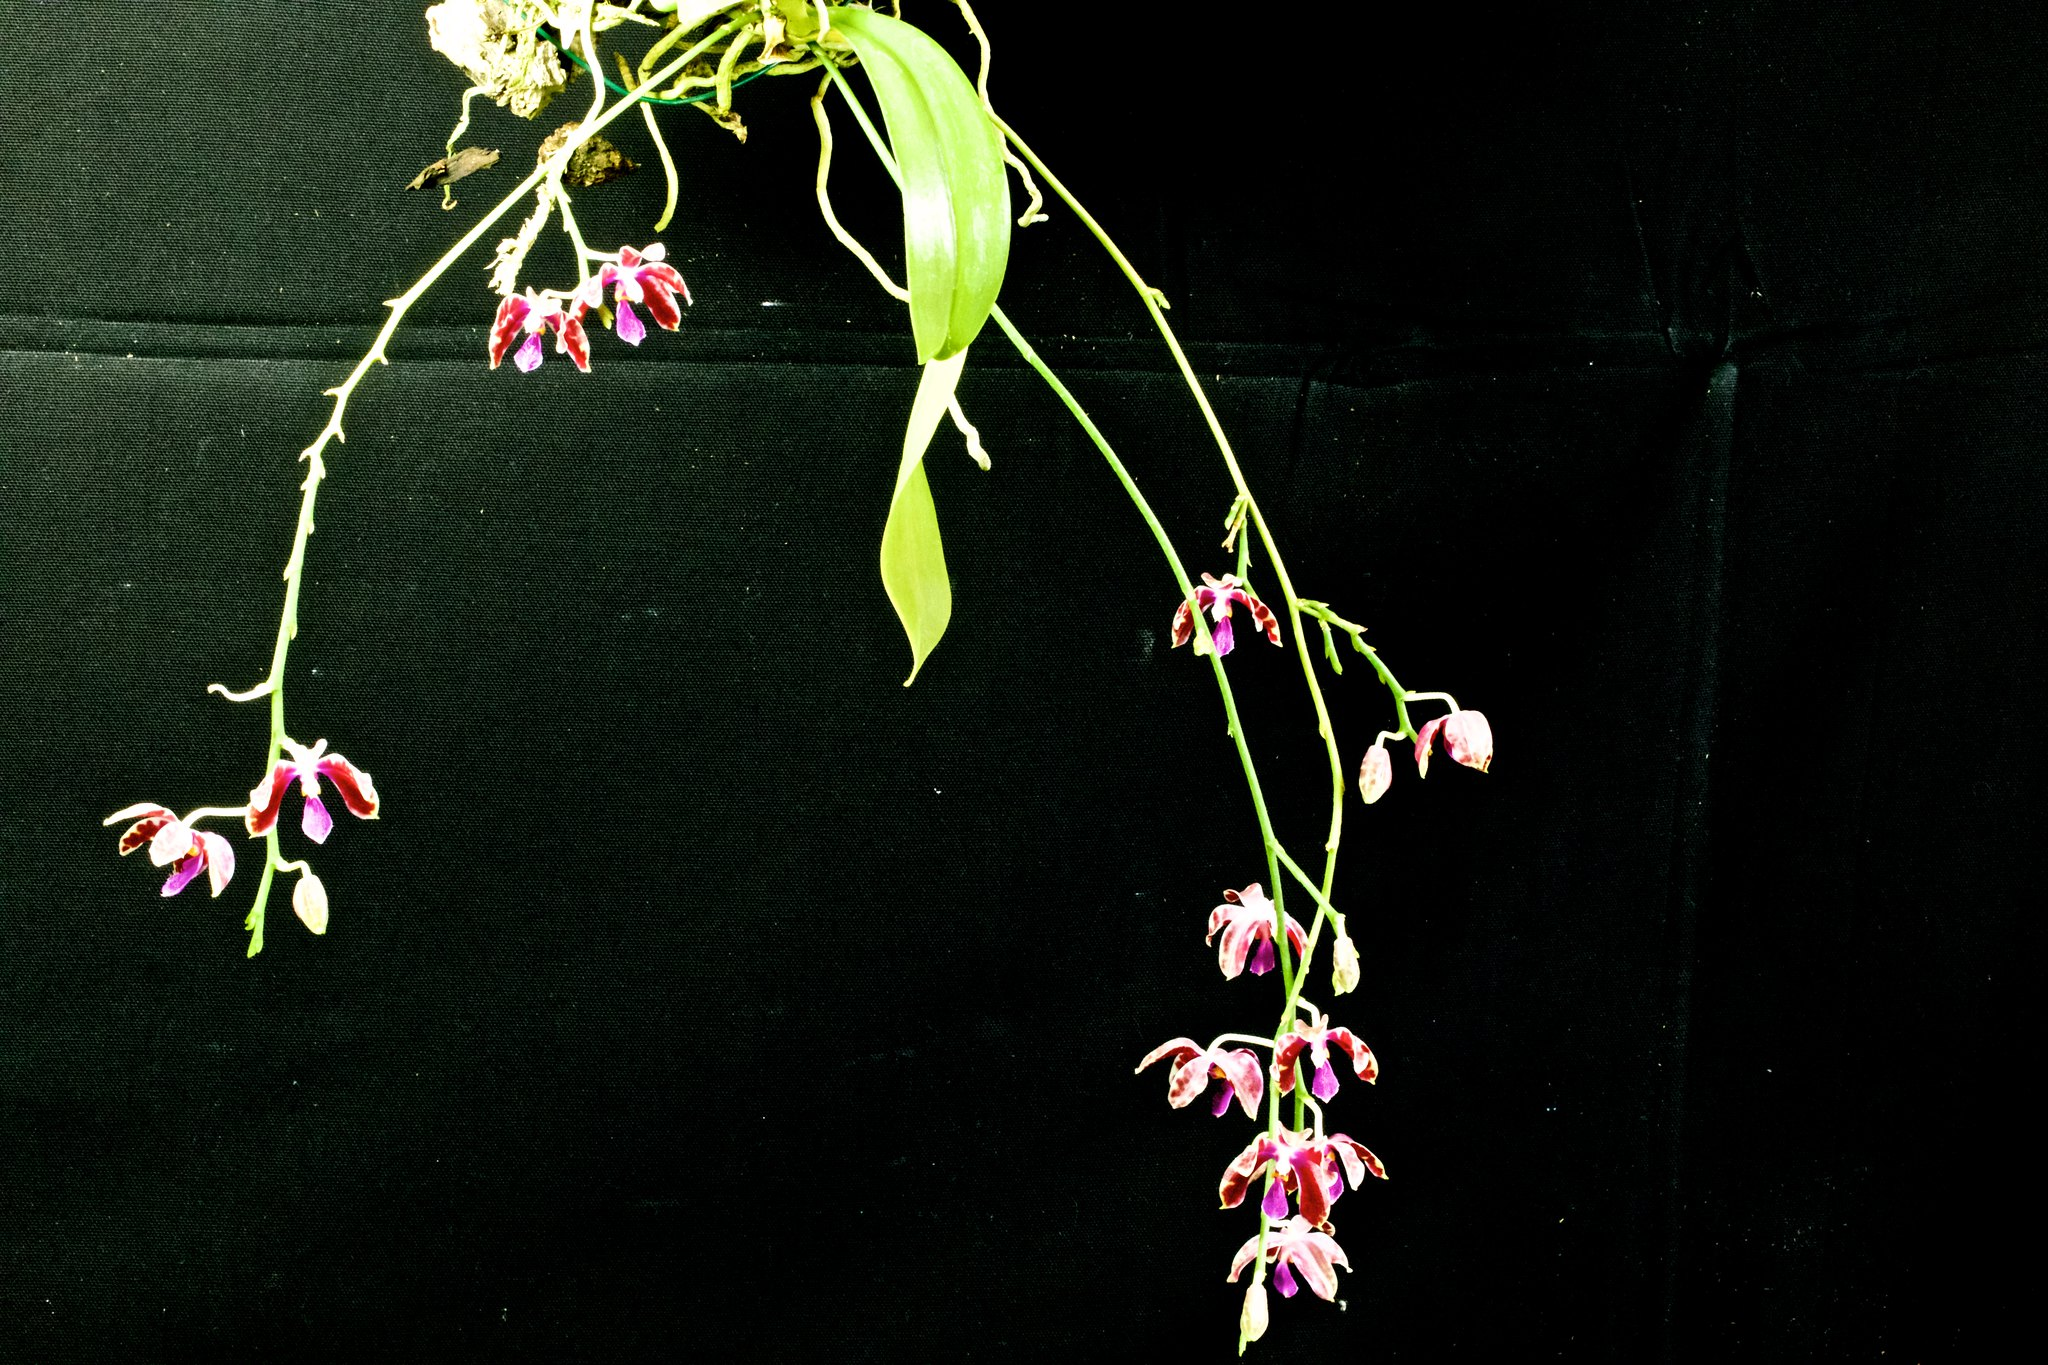 Phalaenopsis mariae x pulchra 20394510945_59ddc8254d_k